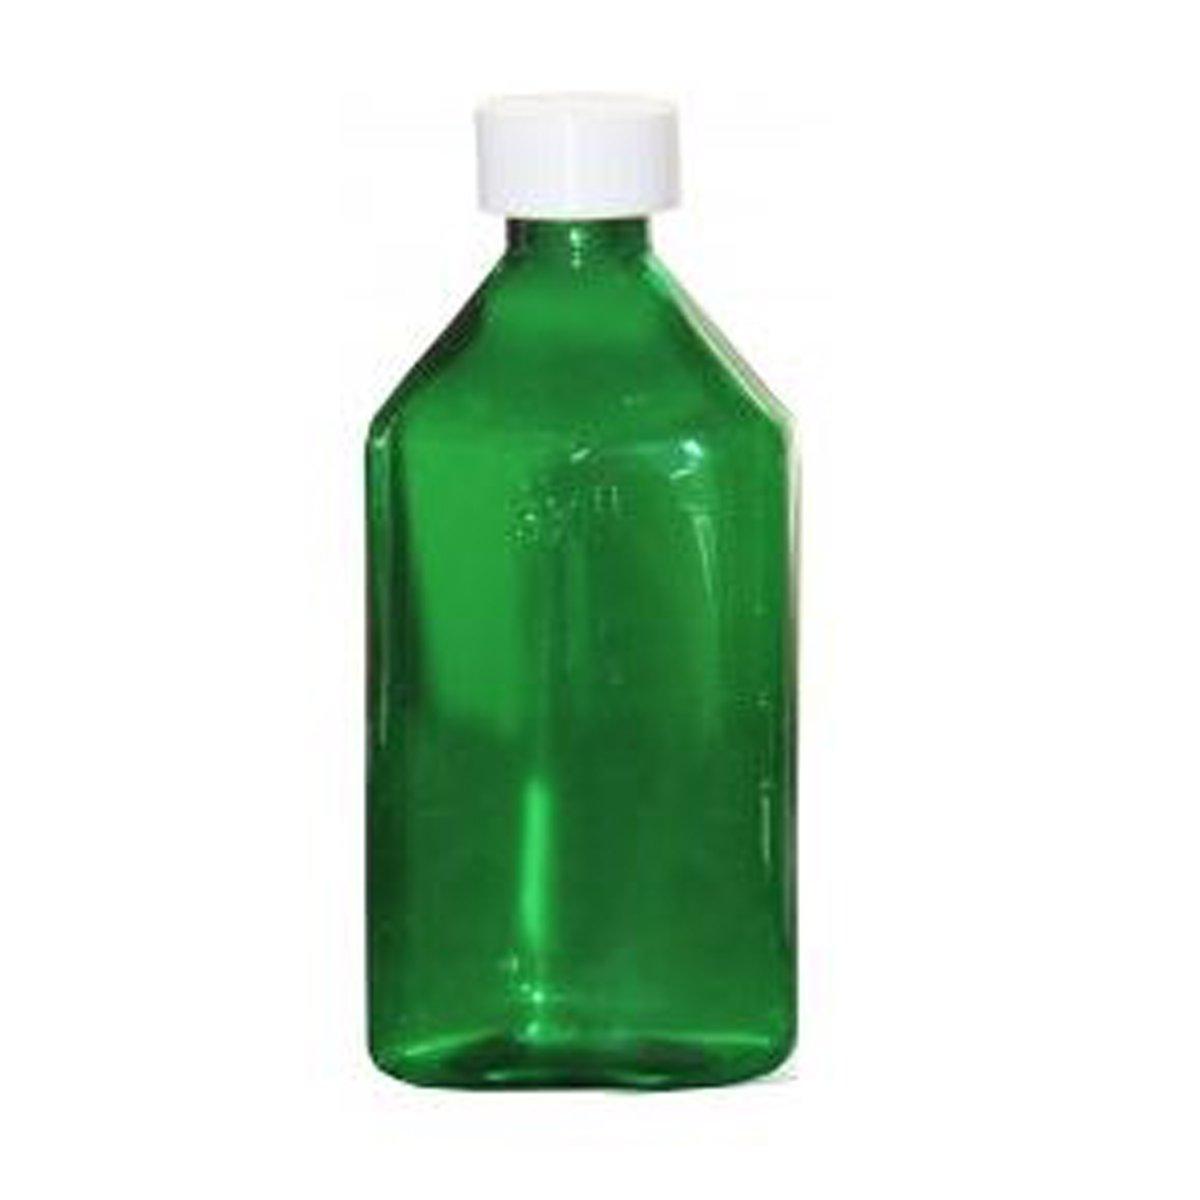 Amexdrug Oval Plastic Bottles - 12 oz - Green - Child Resistant Caps - 12 pcs (Medicine Bottle, Pharmacy Bottle, Liquid Medicine)